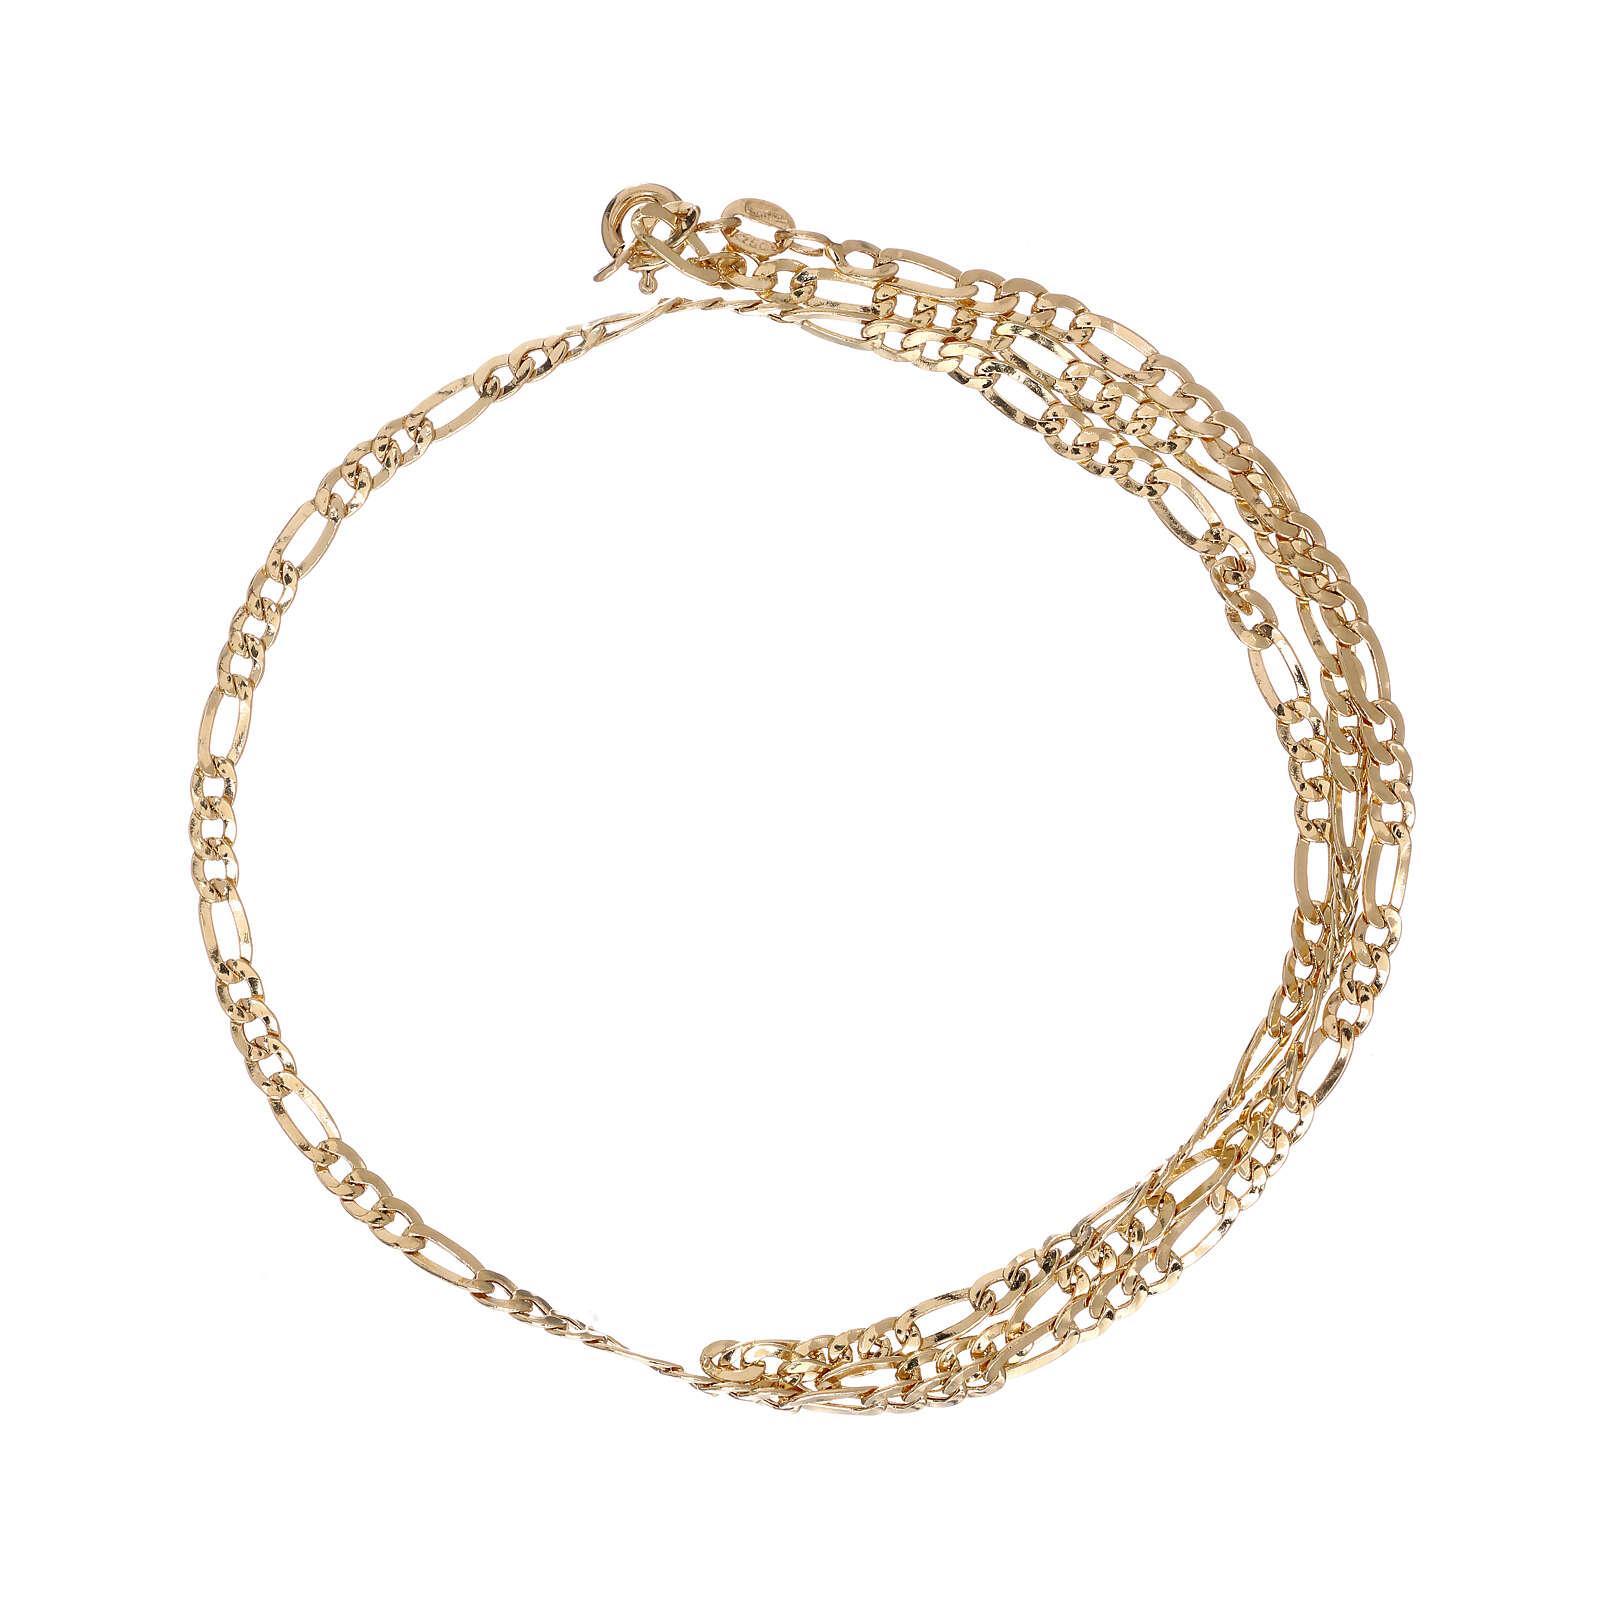 Figaro chain 18-carat yellow gold 19 3/4 in 4